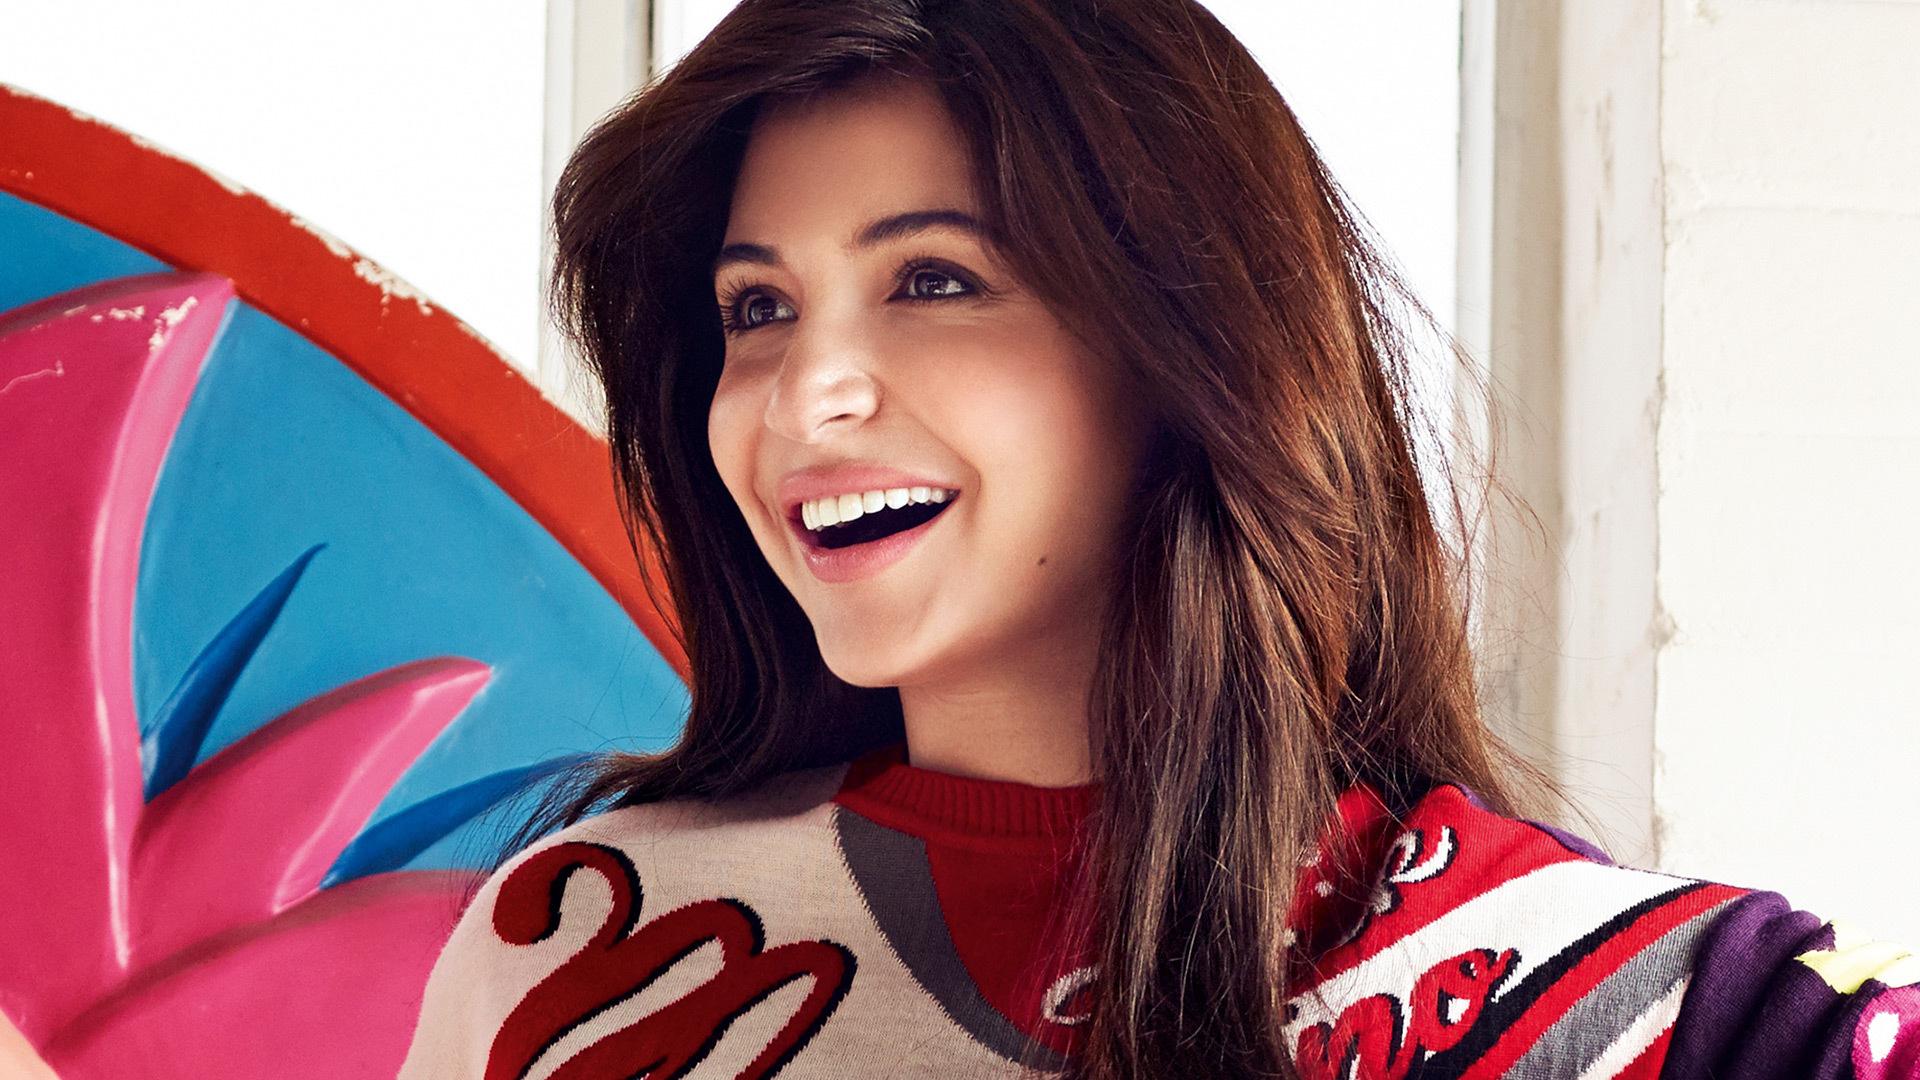 Download 1920x1080 Wallpaper Anushka Sharma Vogue India Full Hd